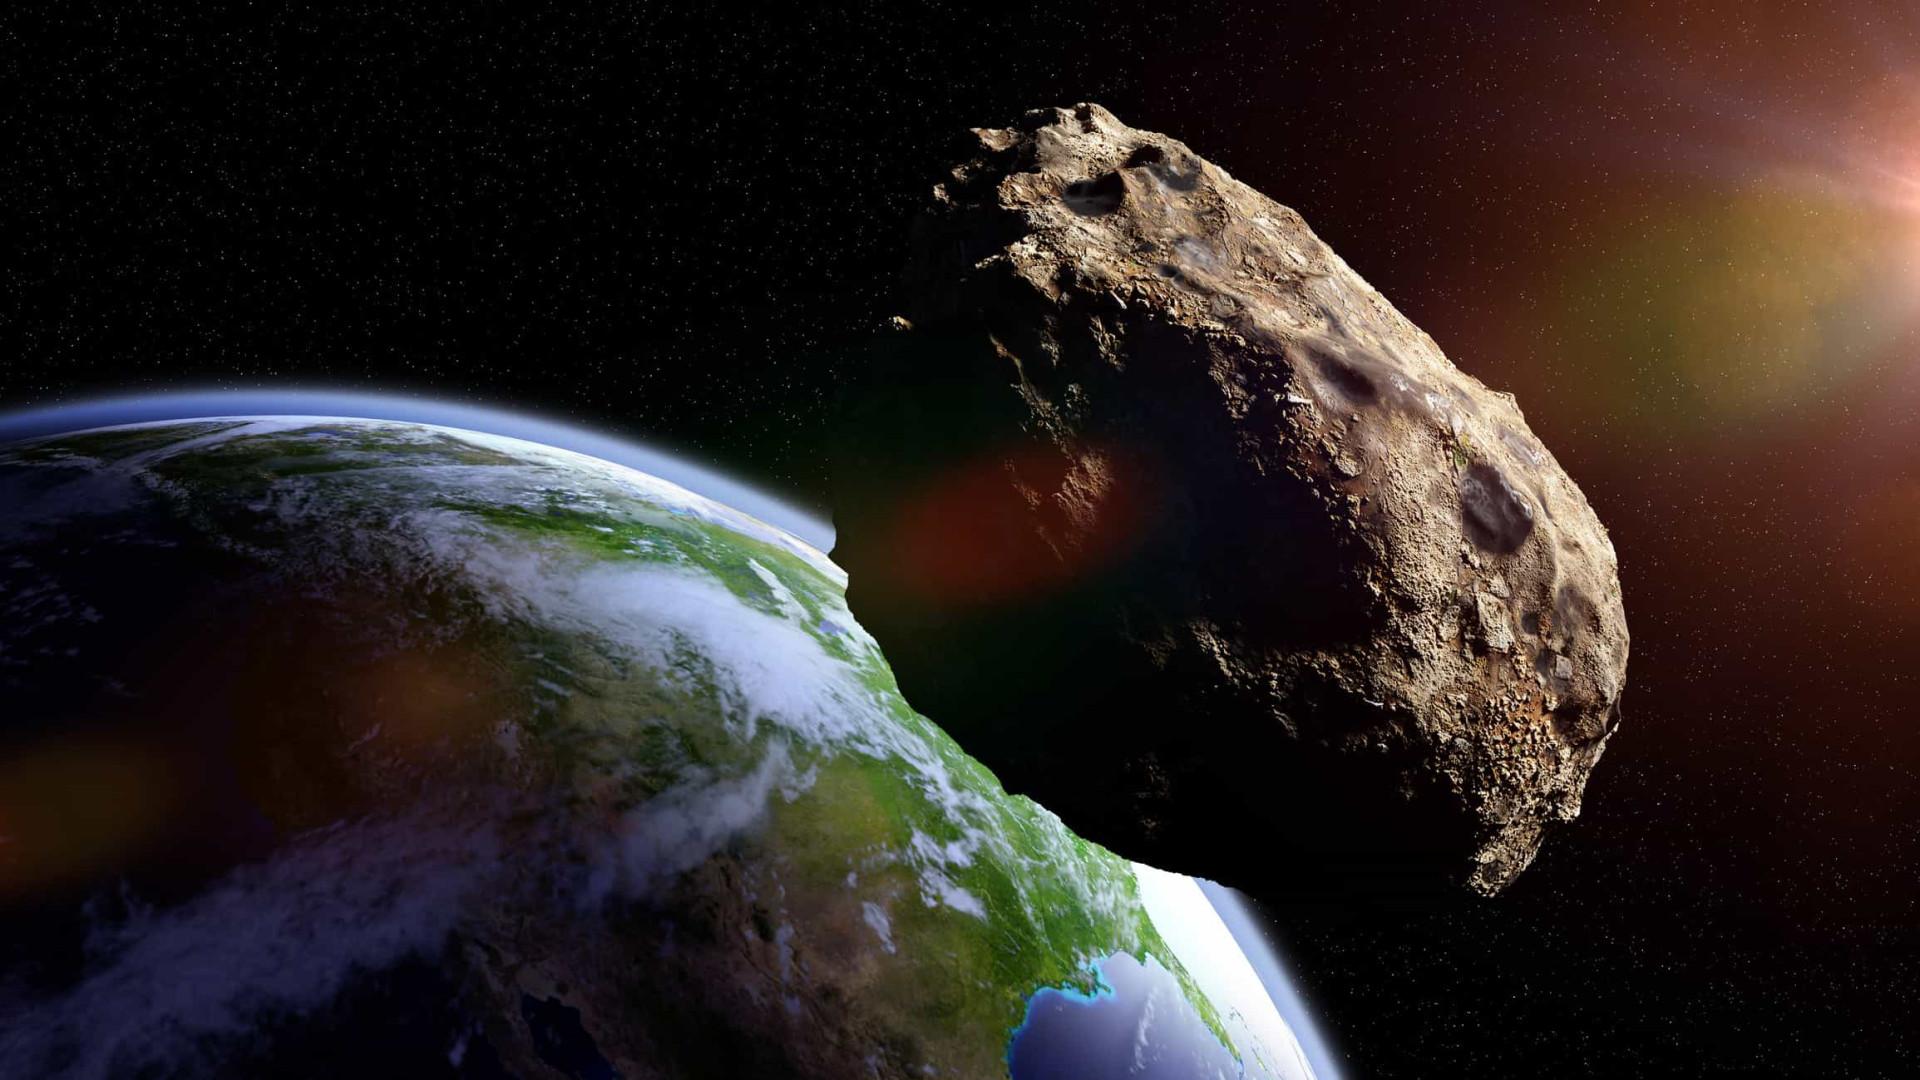 Asteroide passará pela Terra na próxima semana